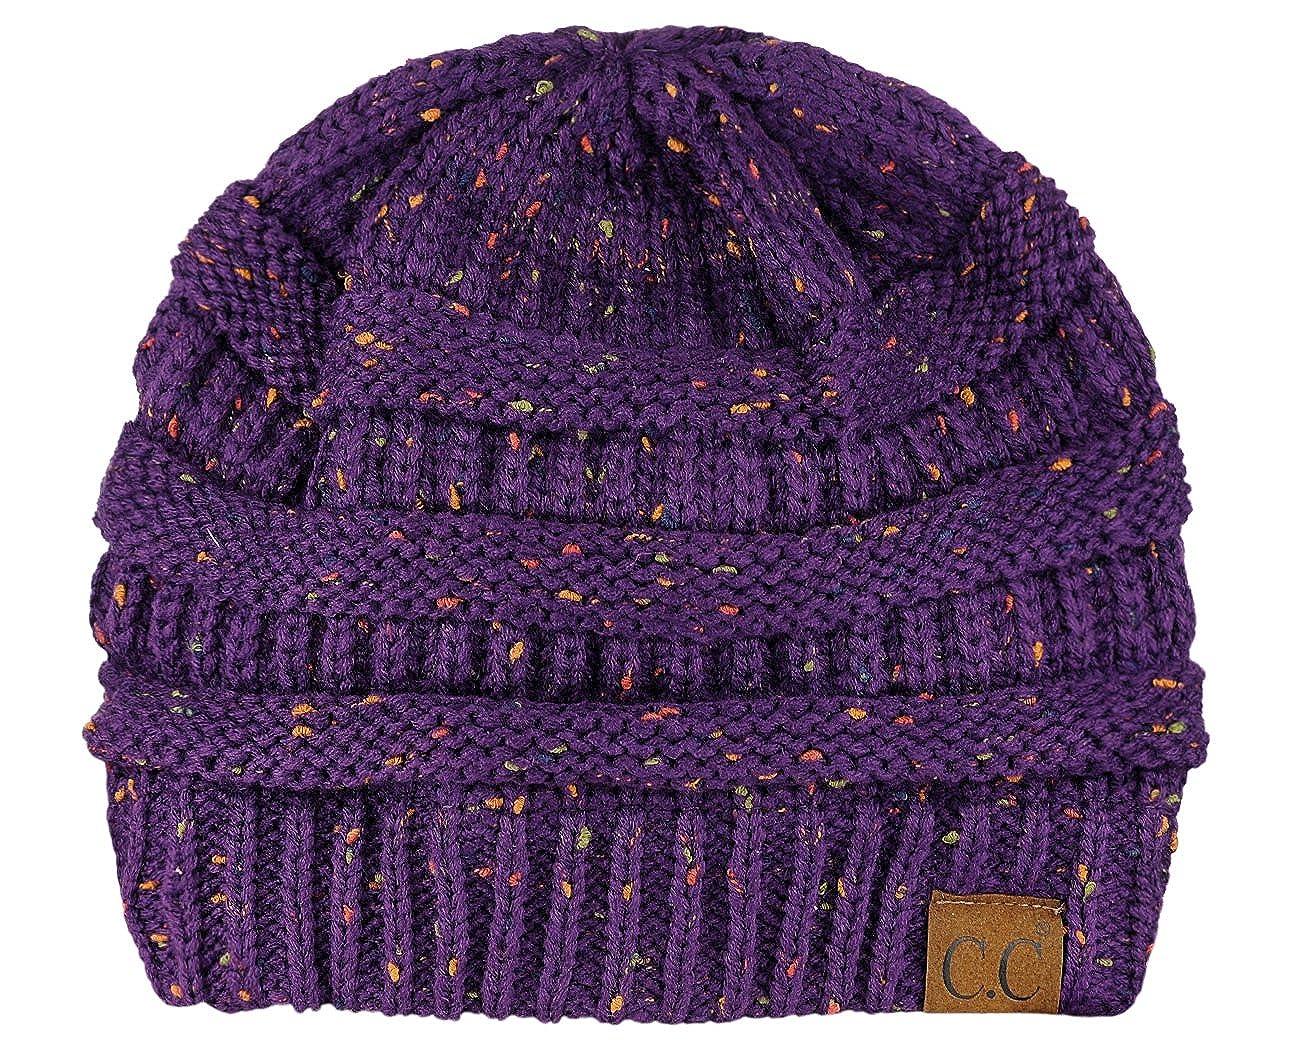 bf8e22283df Amazon.com  C.C Unisex Colorful Confetti Soft Stretch Cable Knit Beanie  Skull Cap - Dark Purple  Clothing